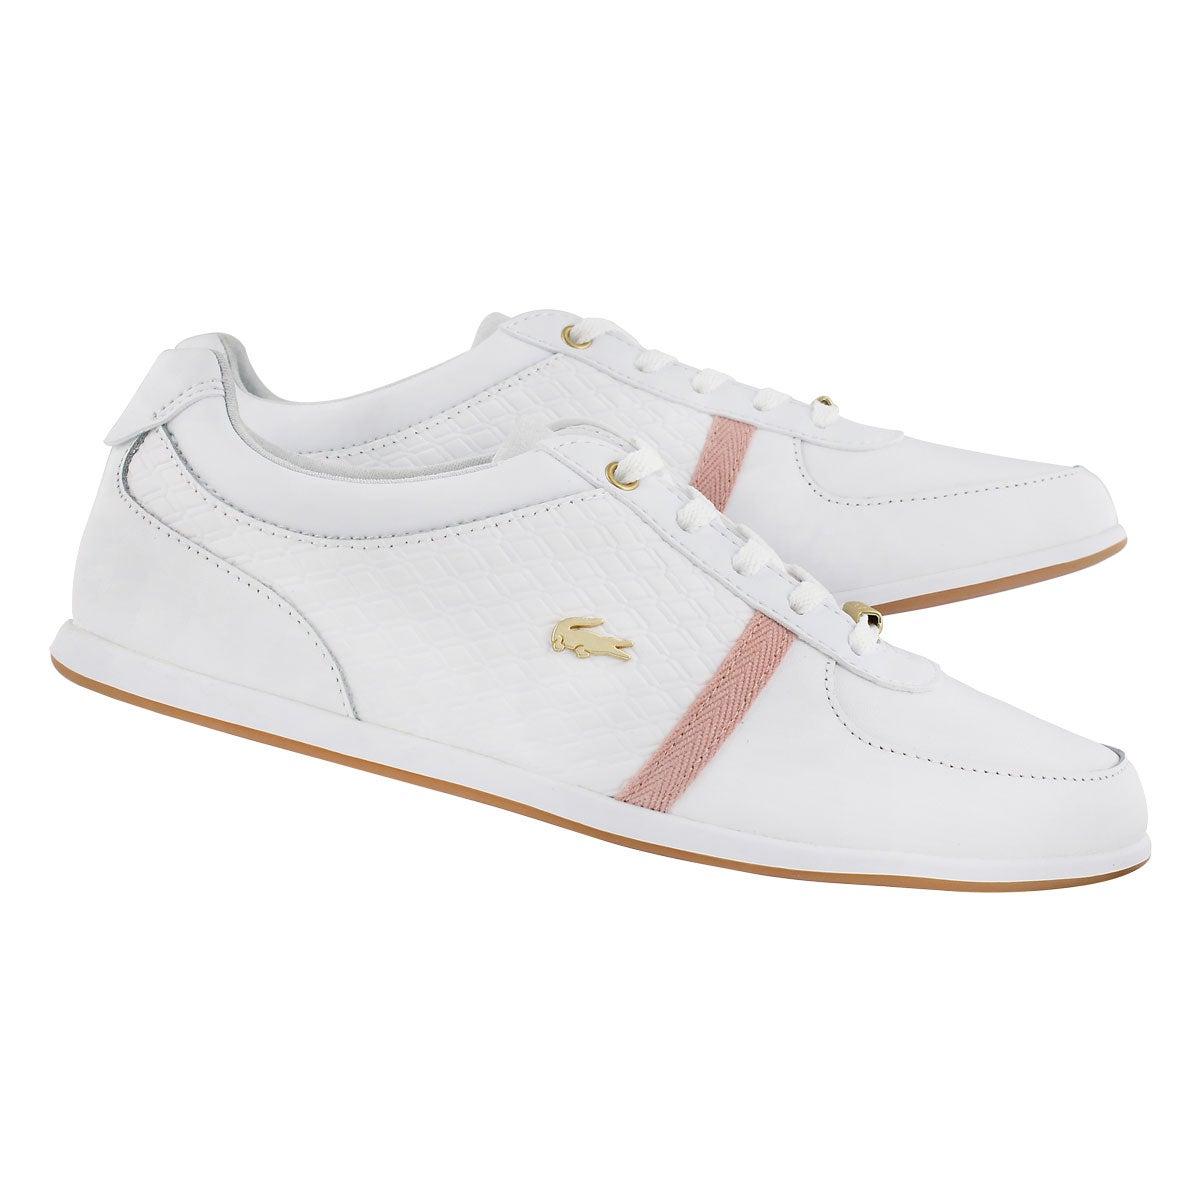 Lds ReySport318 wht/pnk fashion sneakr